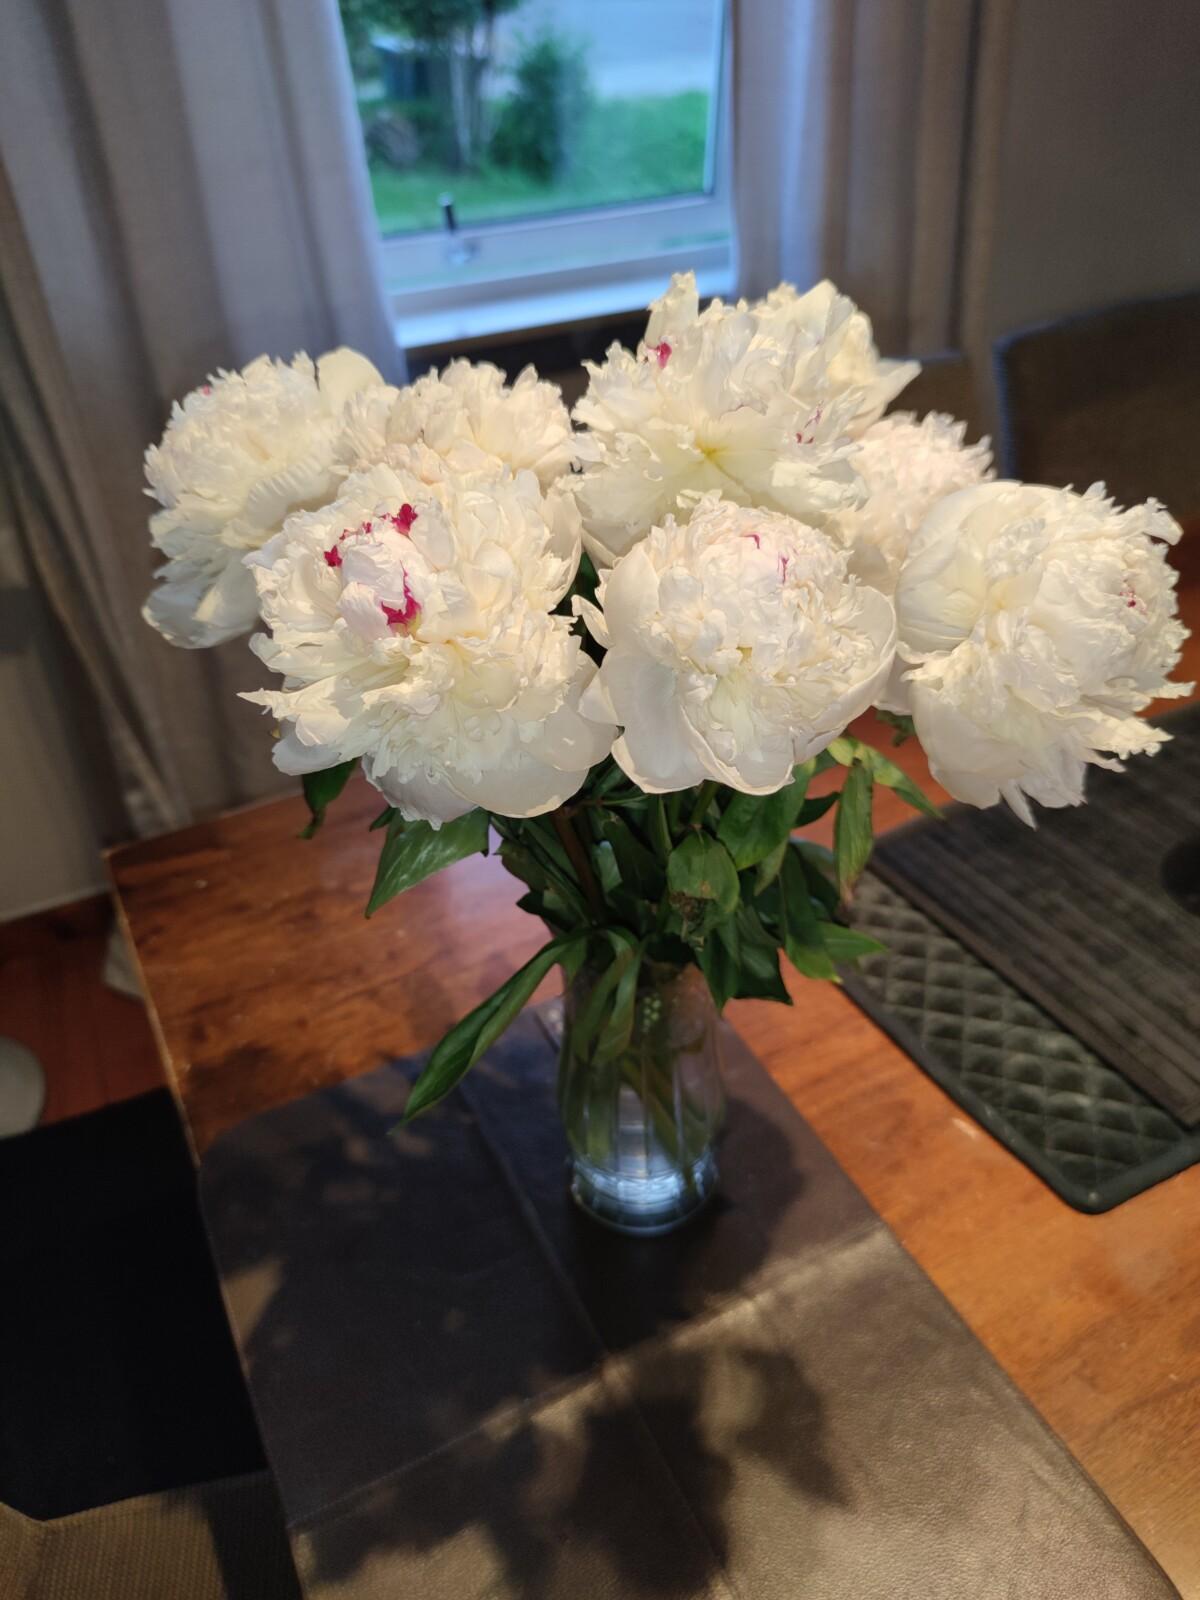 blomster-gave-isalicious-isalicious1-isalicious.blogg.no-ukensbilde-bloggno-blogg-blogger-taco-tacofredag-mat-middag-natur-slush-